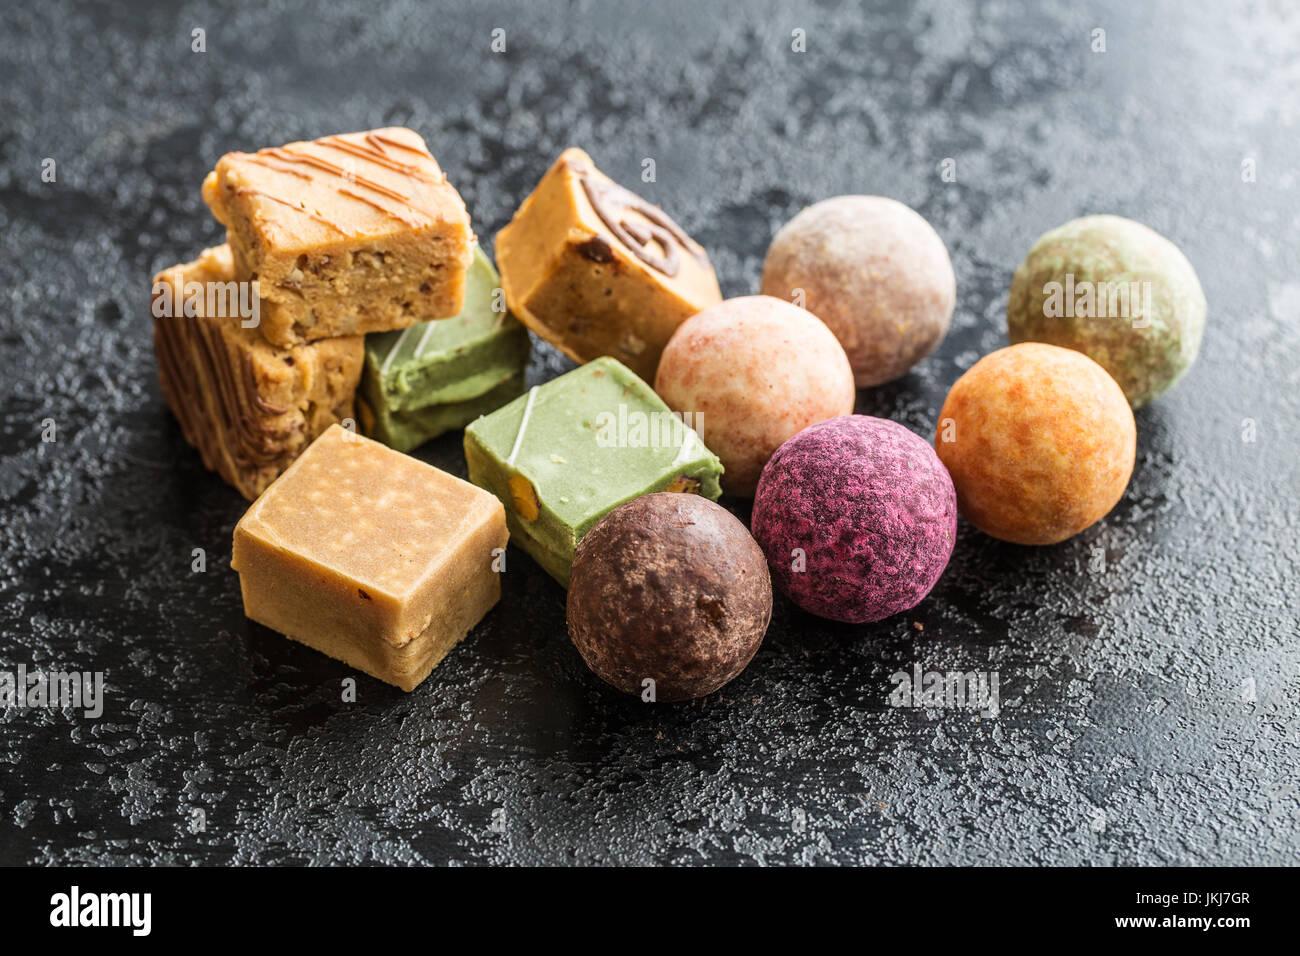 Verschiedene süße Bonbons. Trüffel und Karamell Bonbons. Stockbild